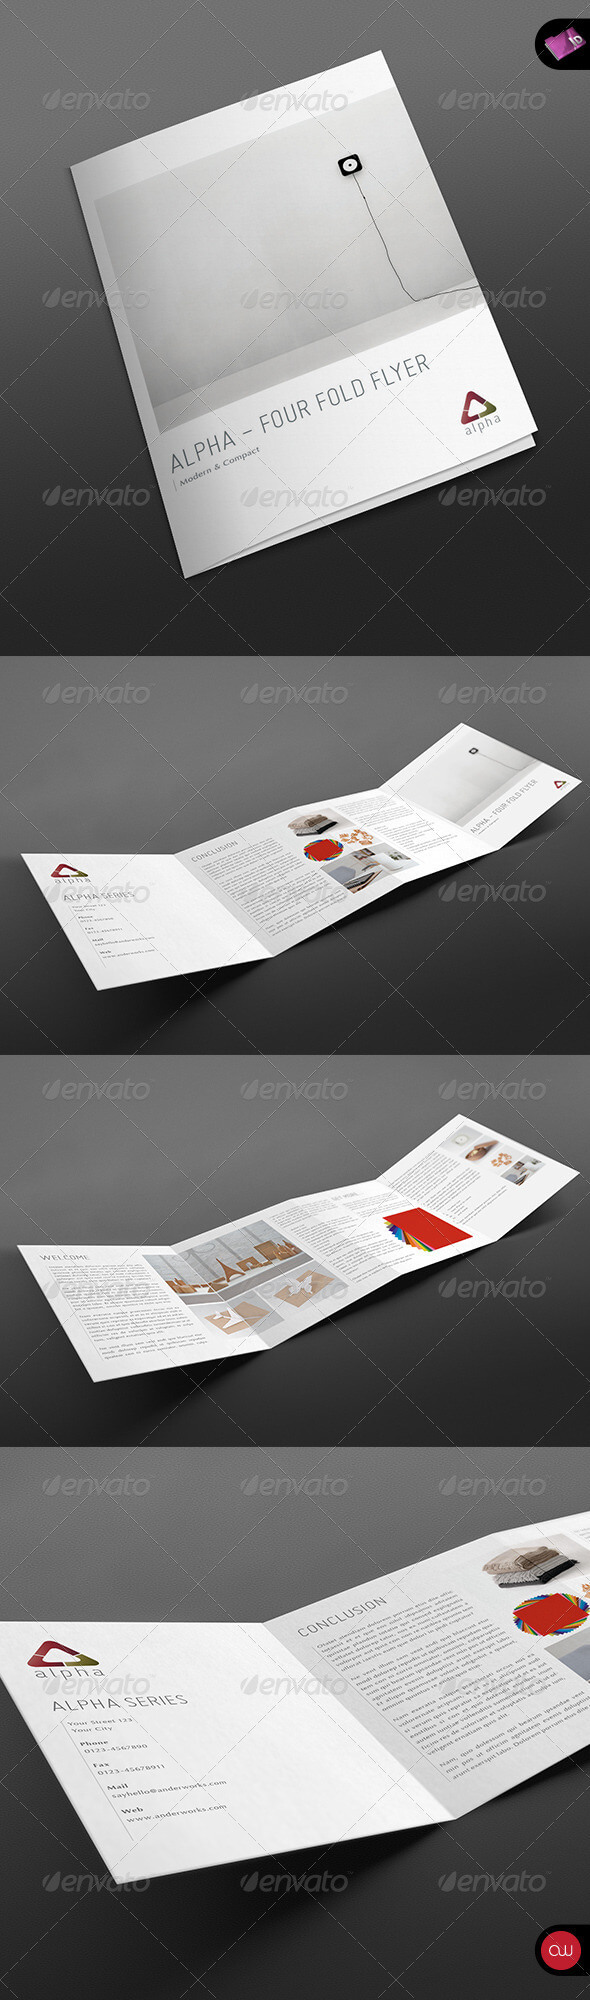 4-Fold Brochure Template - Vol.2 #graphicriver Modern And within 4 Fold Brochure Template